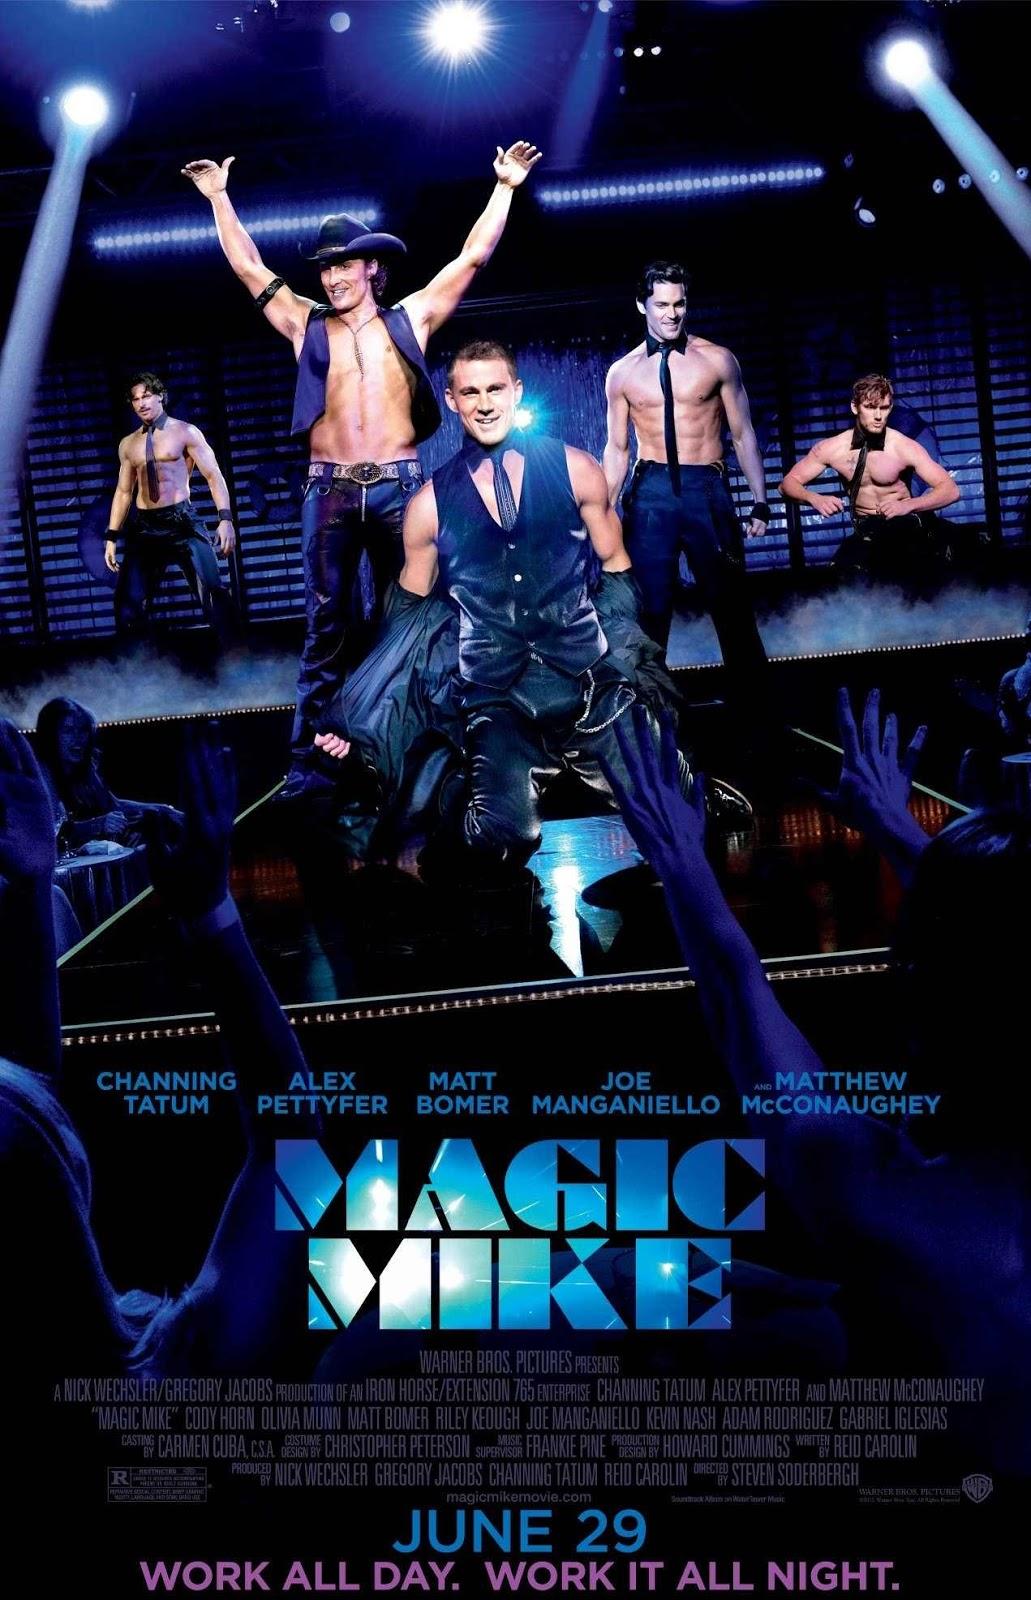 http://1.bp.blogspot.com/-cQCzGViy5tE/UIYpN2tuK3I/AAAAAAAACPM/xsCUq0oGpjo/s1600/magic.jpg